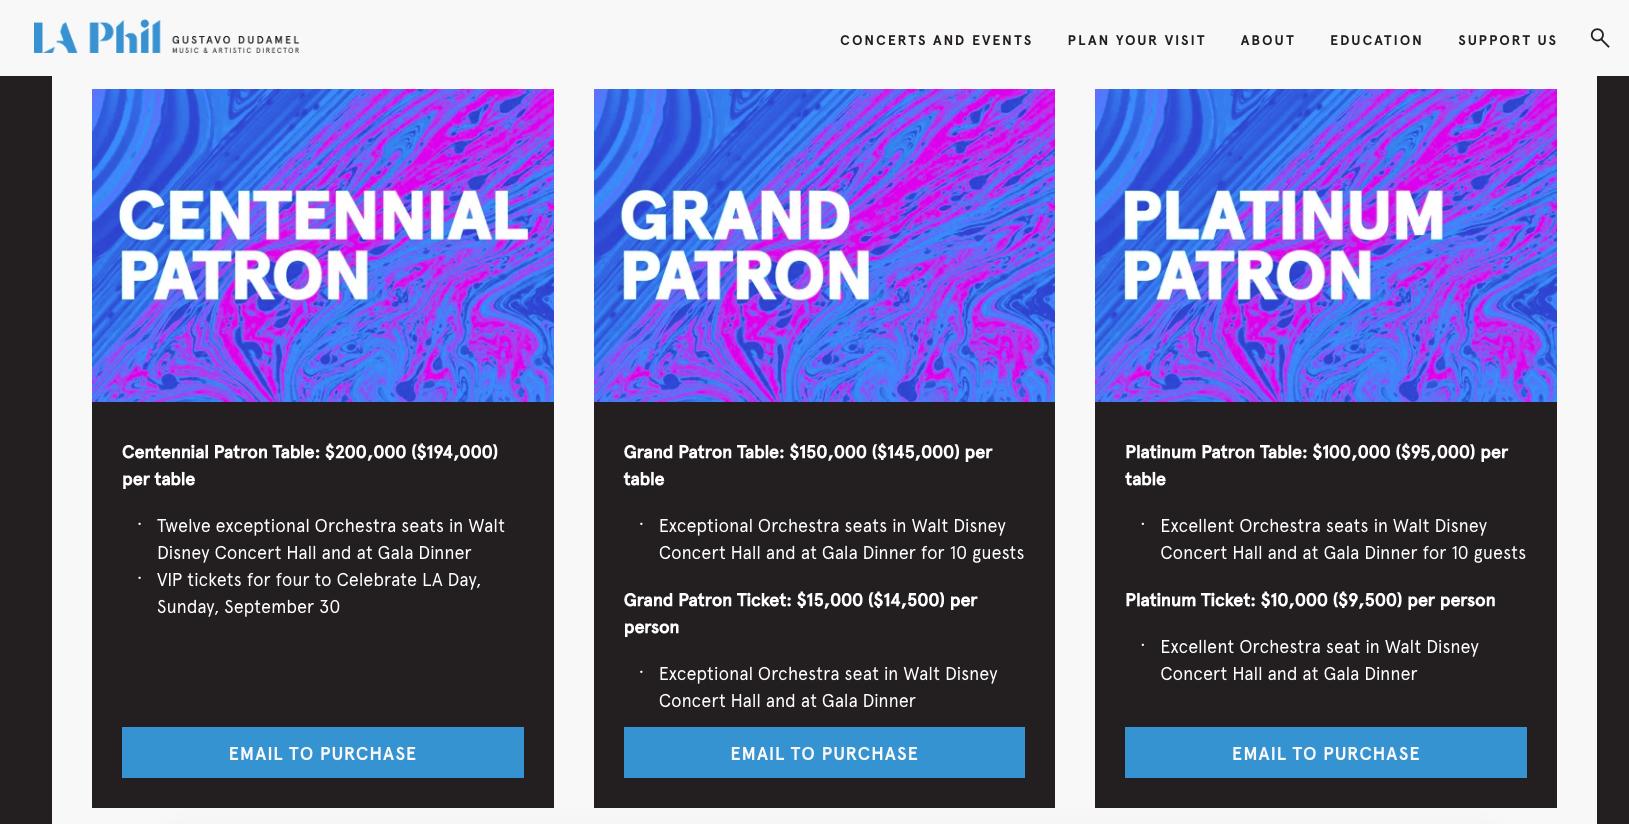 Event Ticket Types for LA Philharmonic